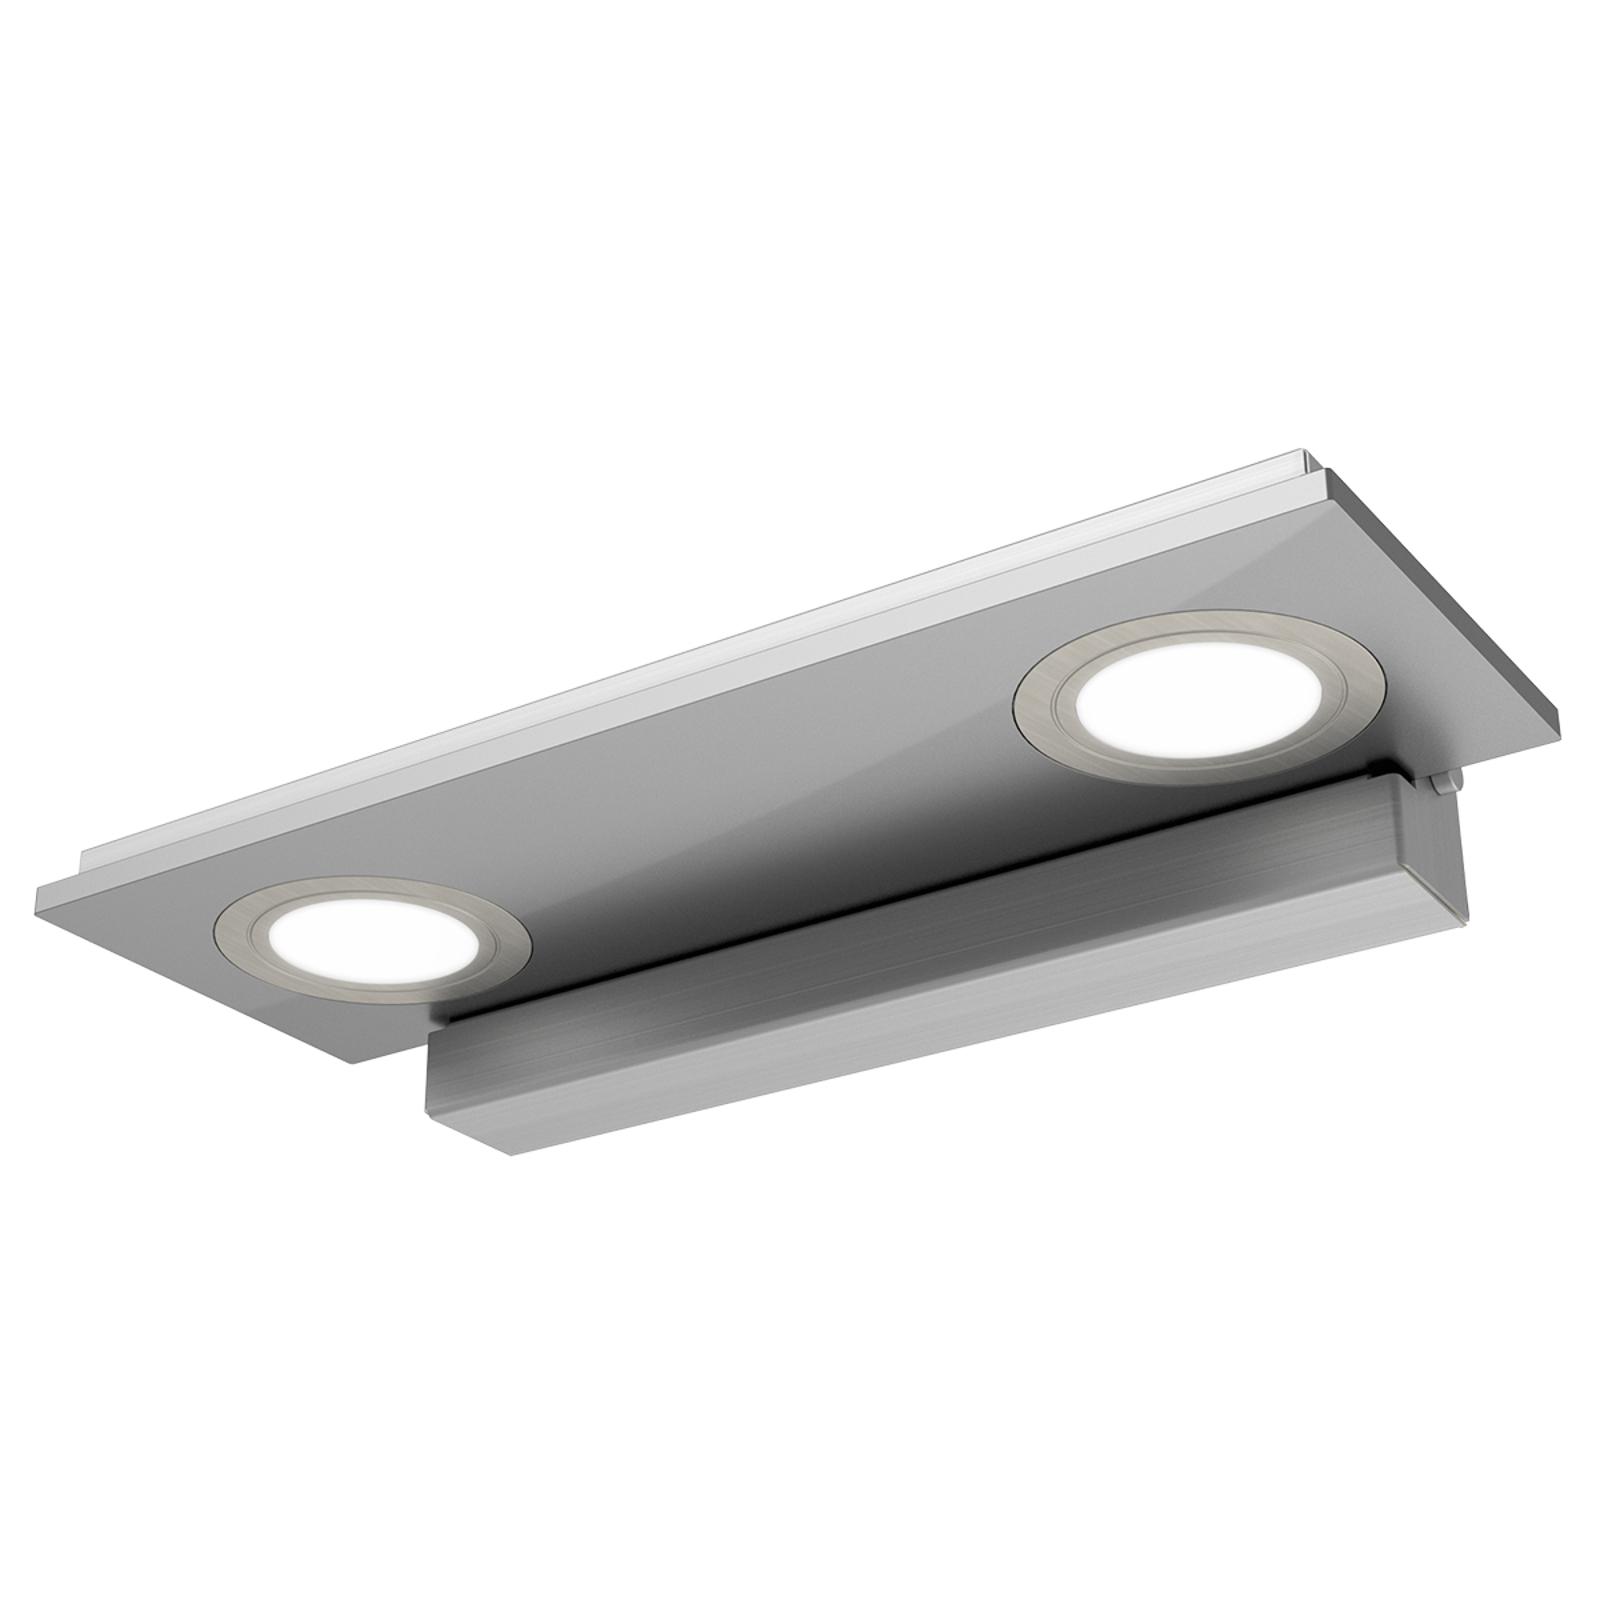 2-lichts LED-wandlamp Pano, metallic